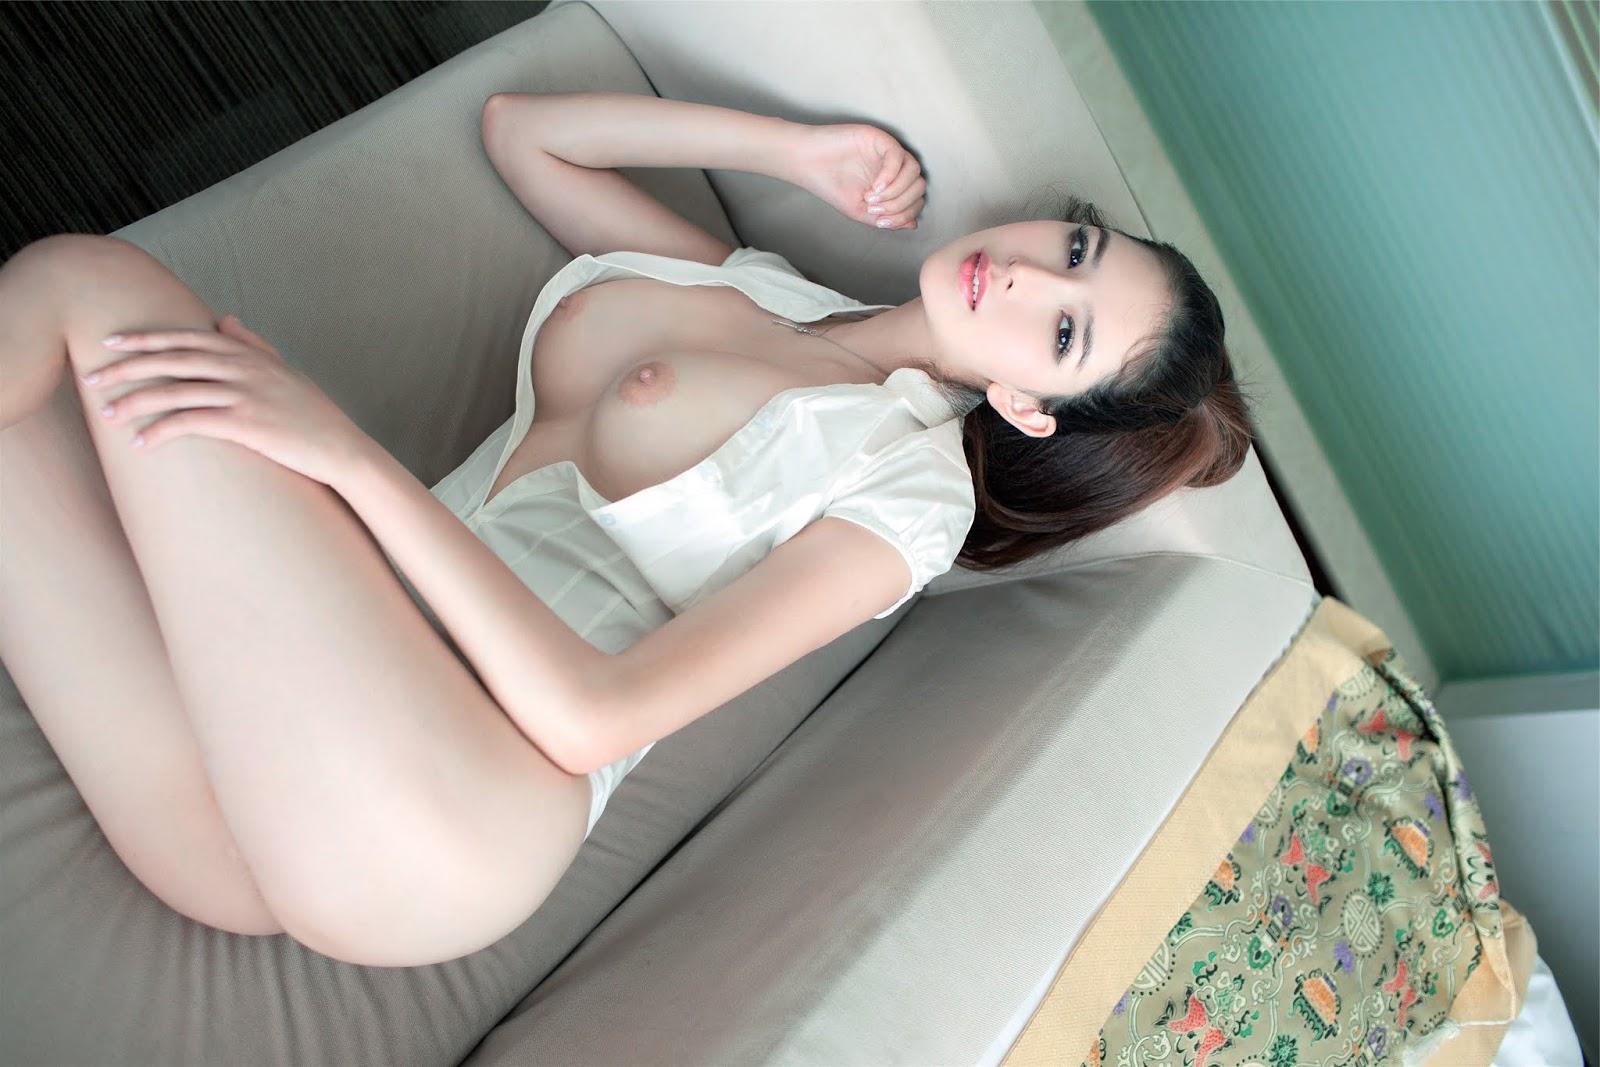 BoolWowGirls%2B%252813%2529 - Li LiSha 李丽莎 Beautiful Nude Model